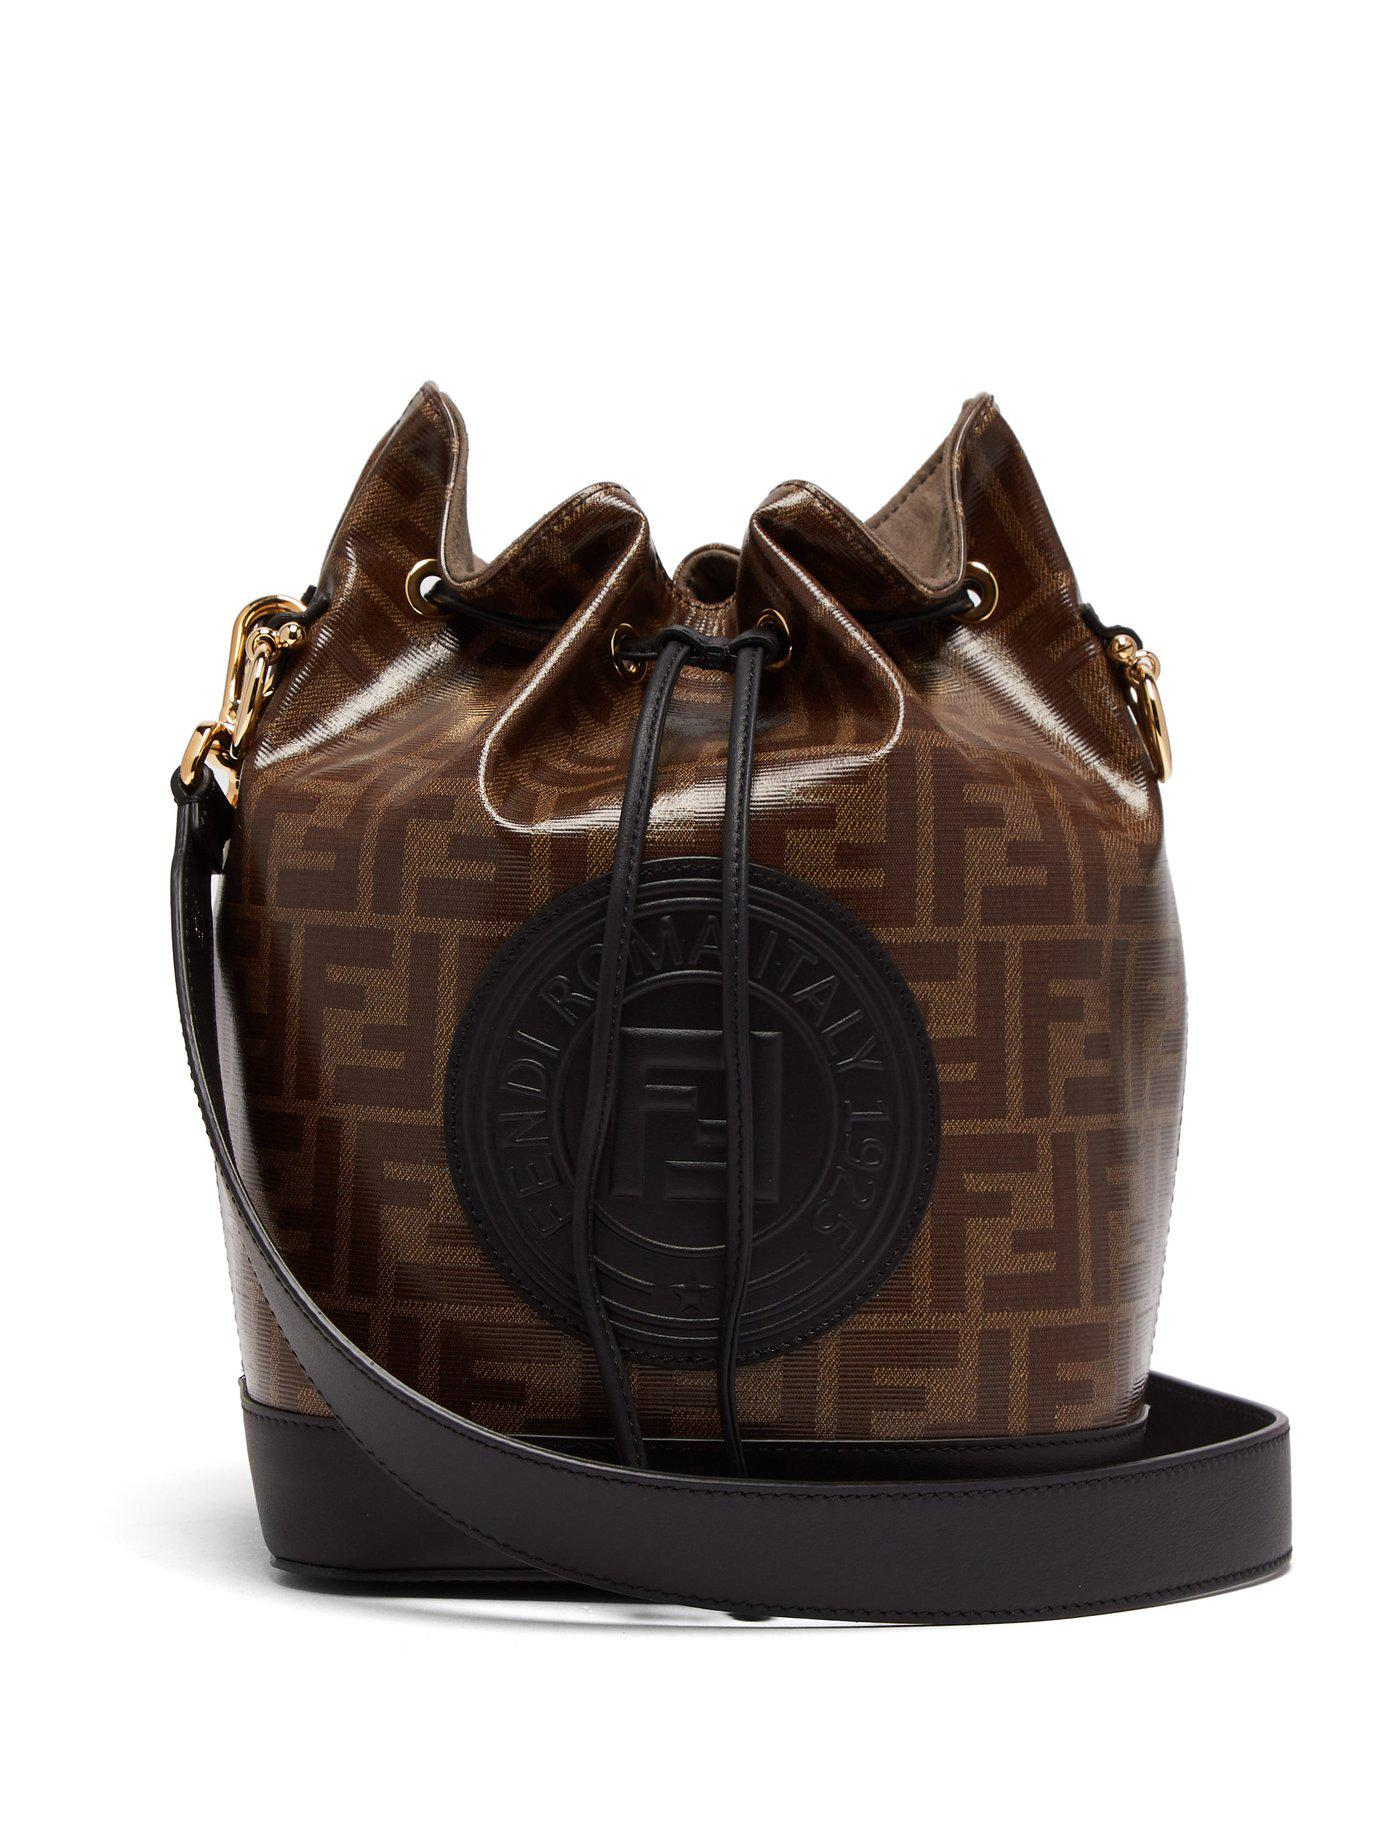 Lyst - Fendi Mon Tresor Ff Jacquard Leather Bucket Bag in Brown 89818fa8328a3